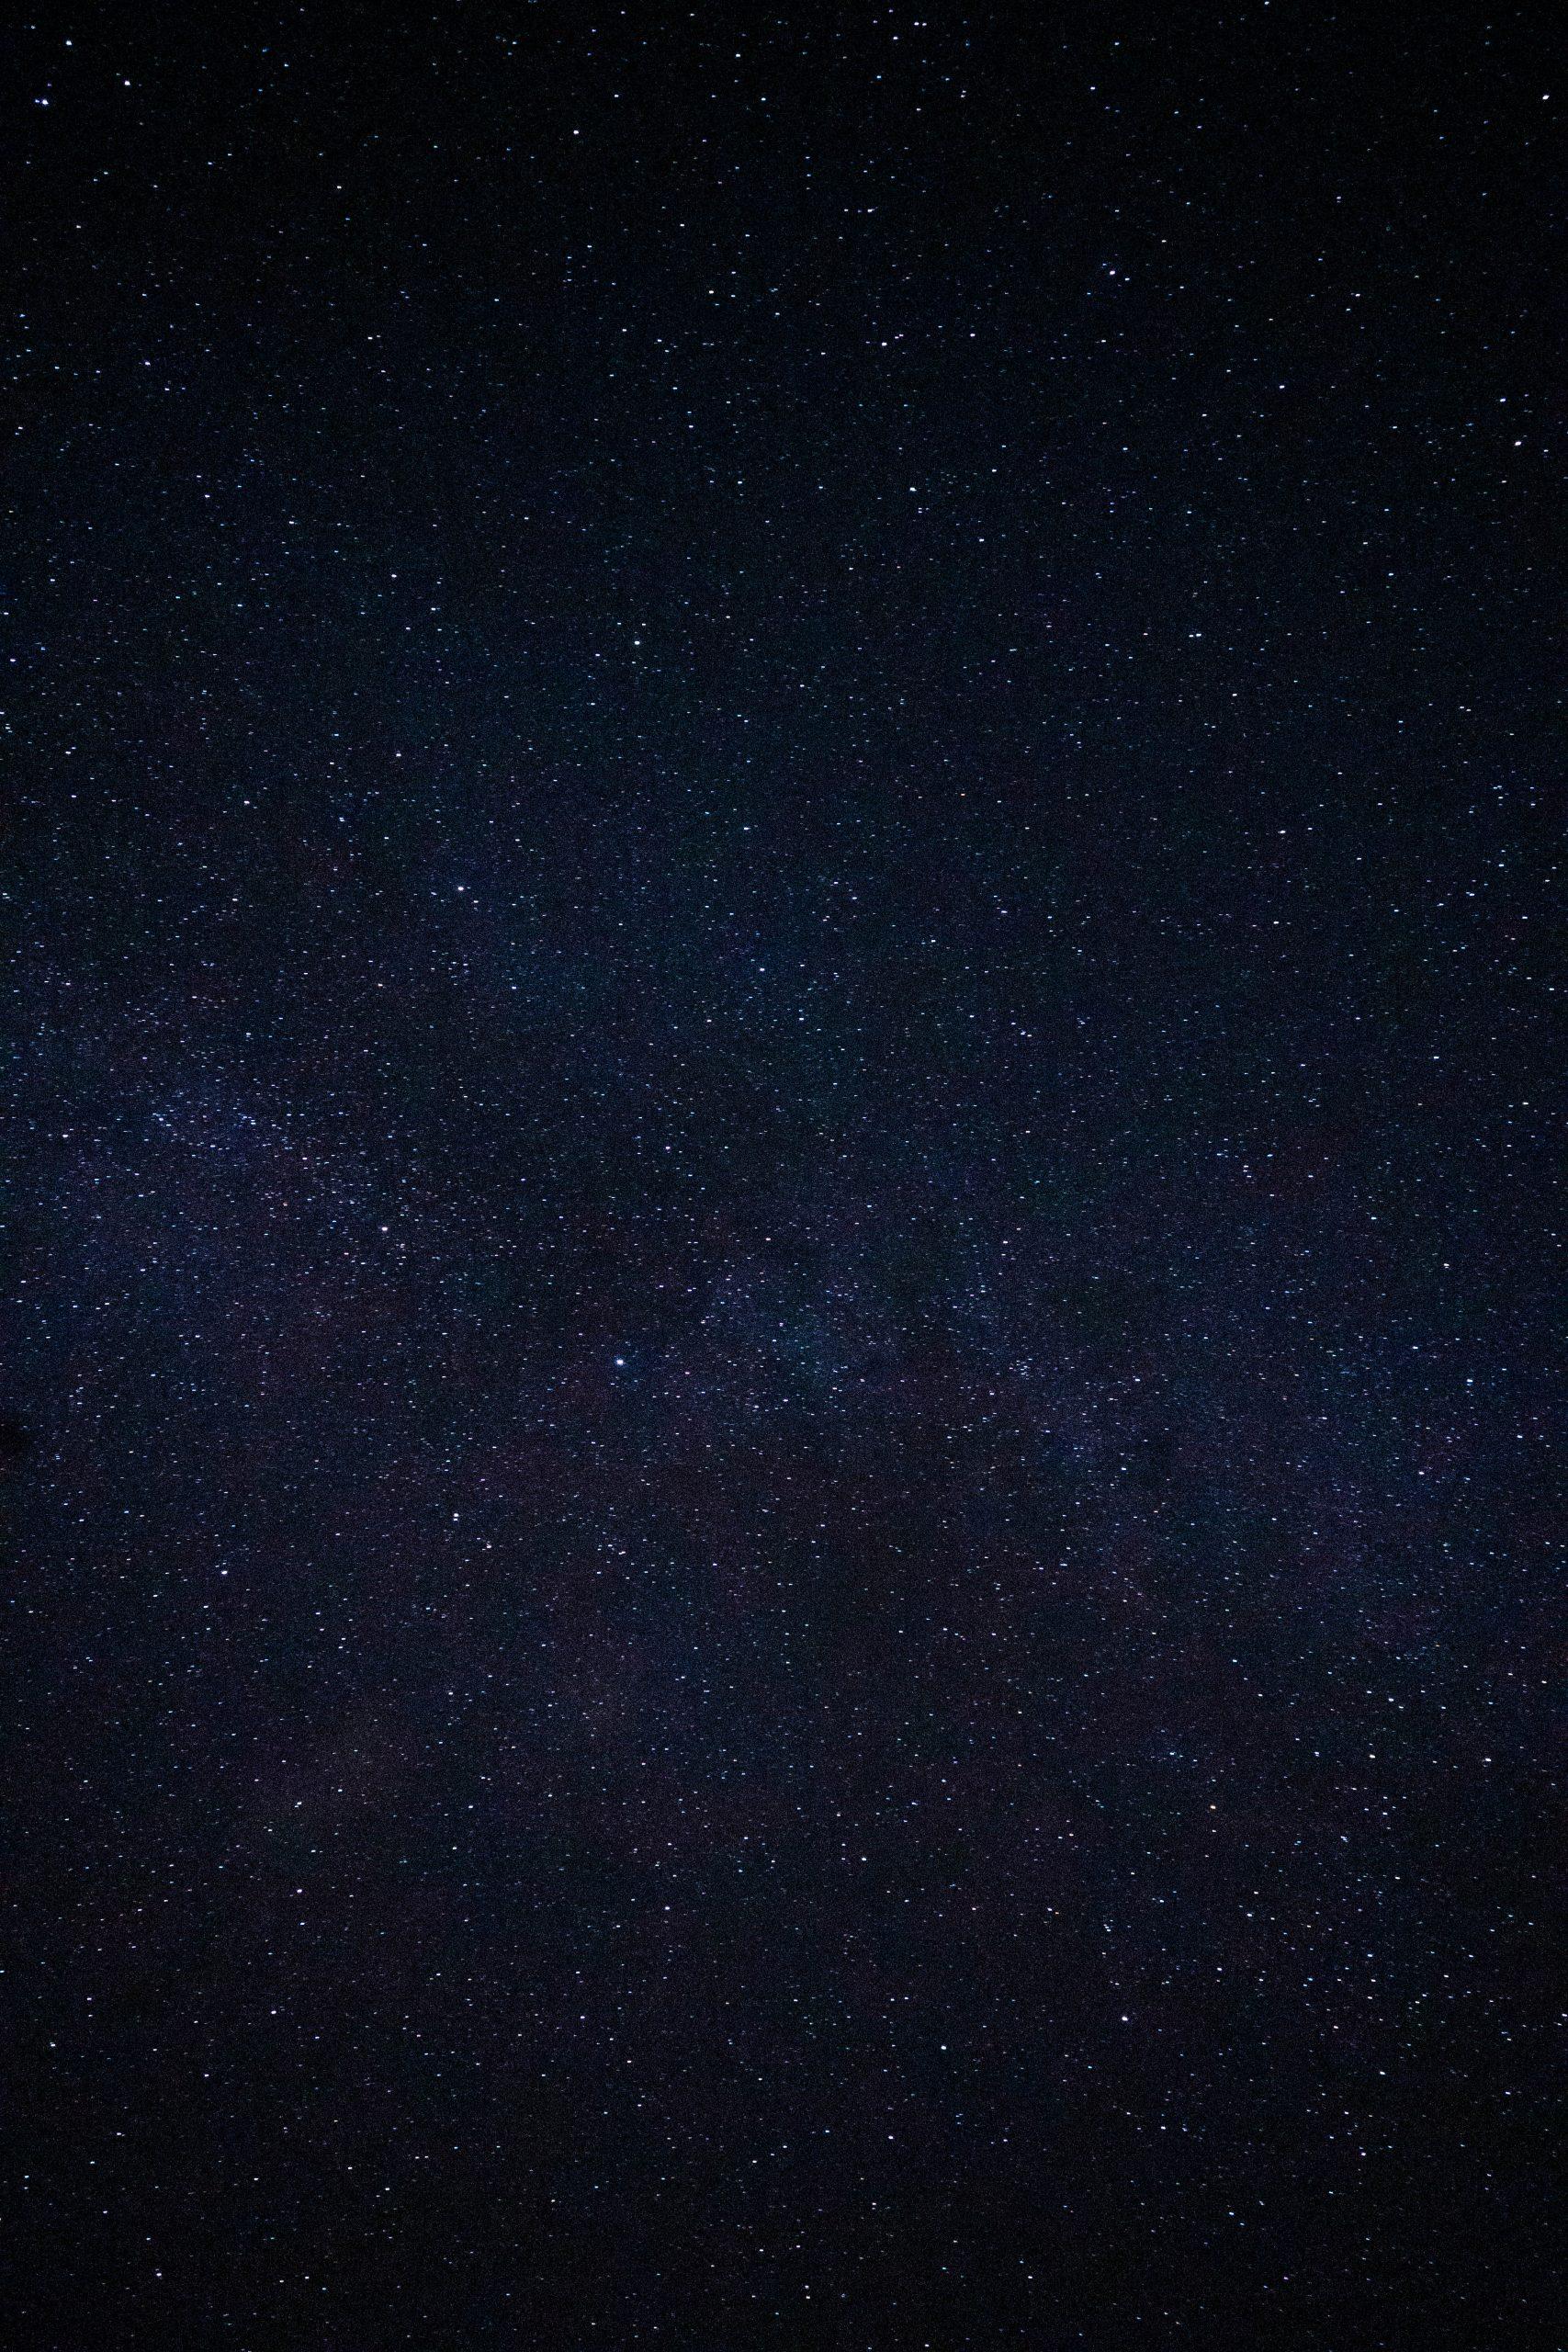 astrophotography stars asia maldives sony a7iii clear night sky